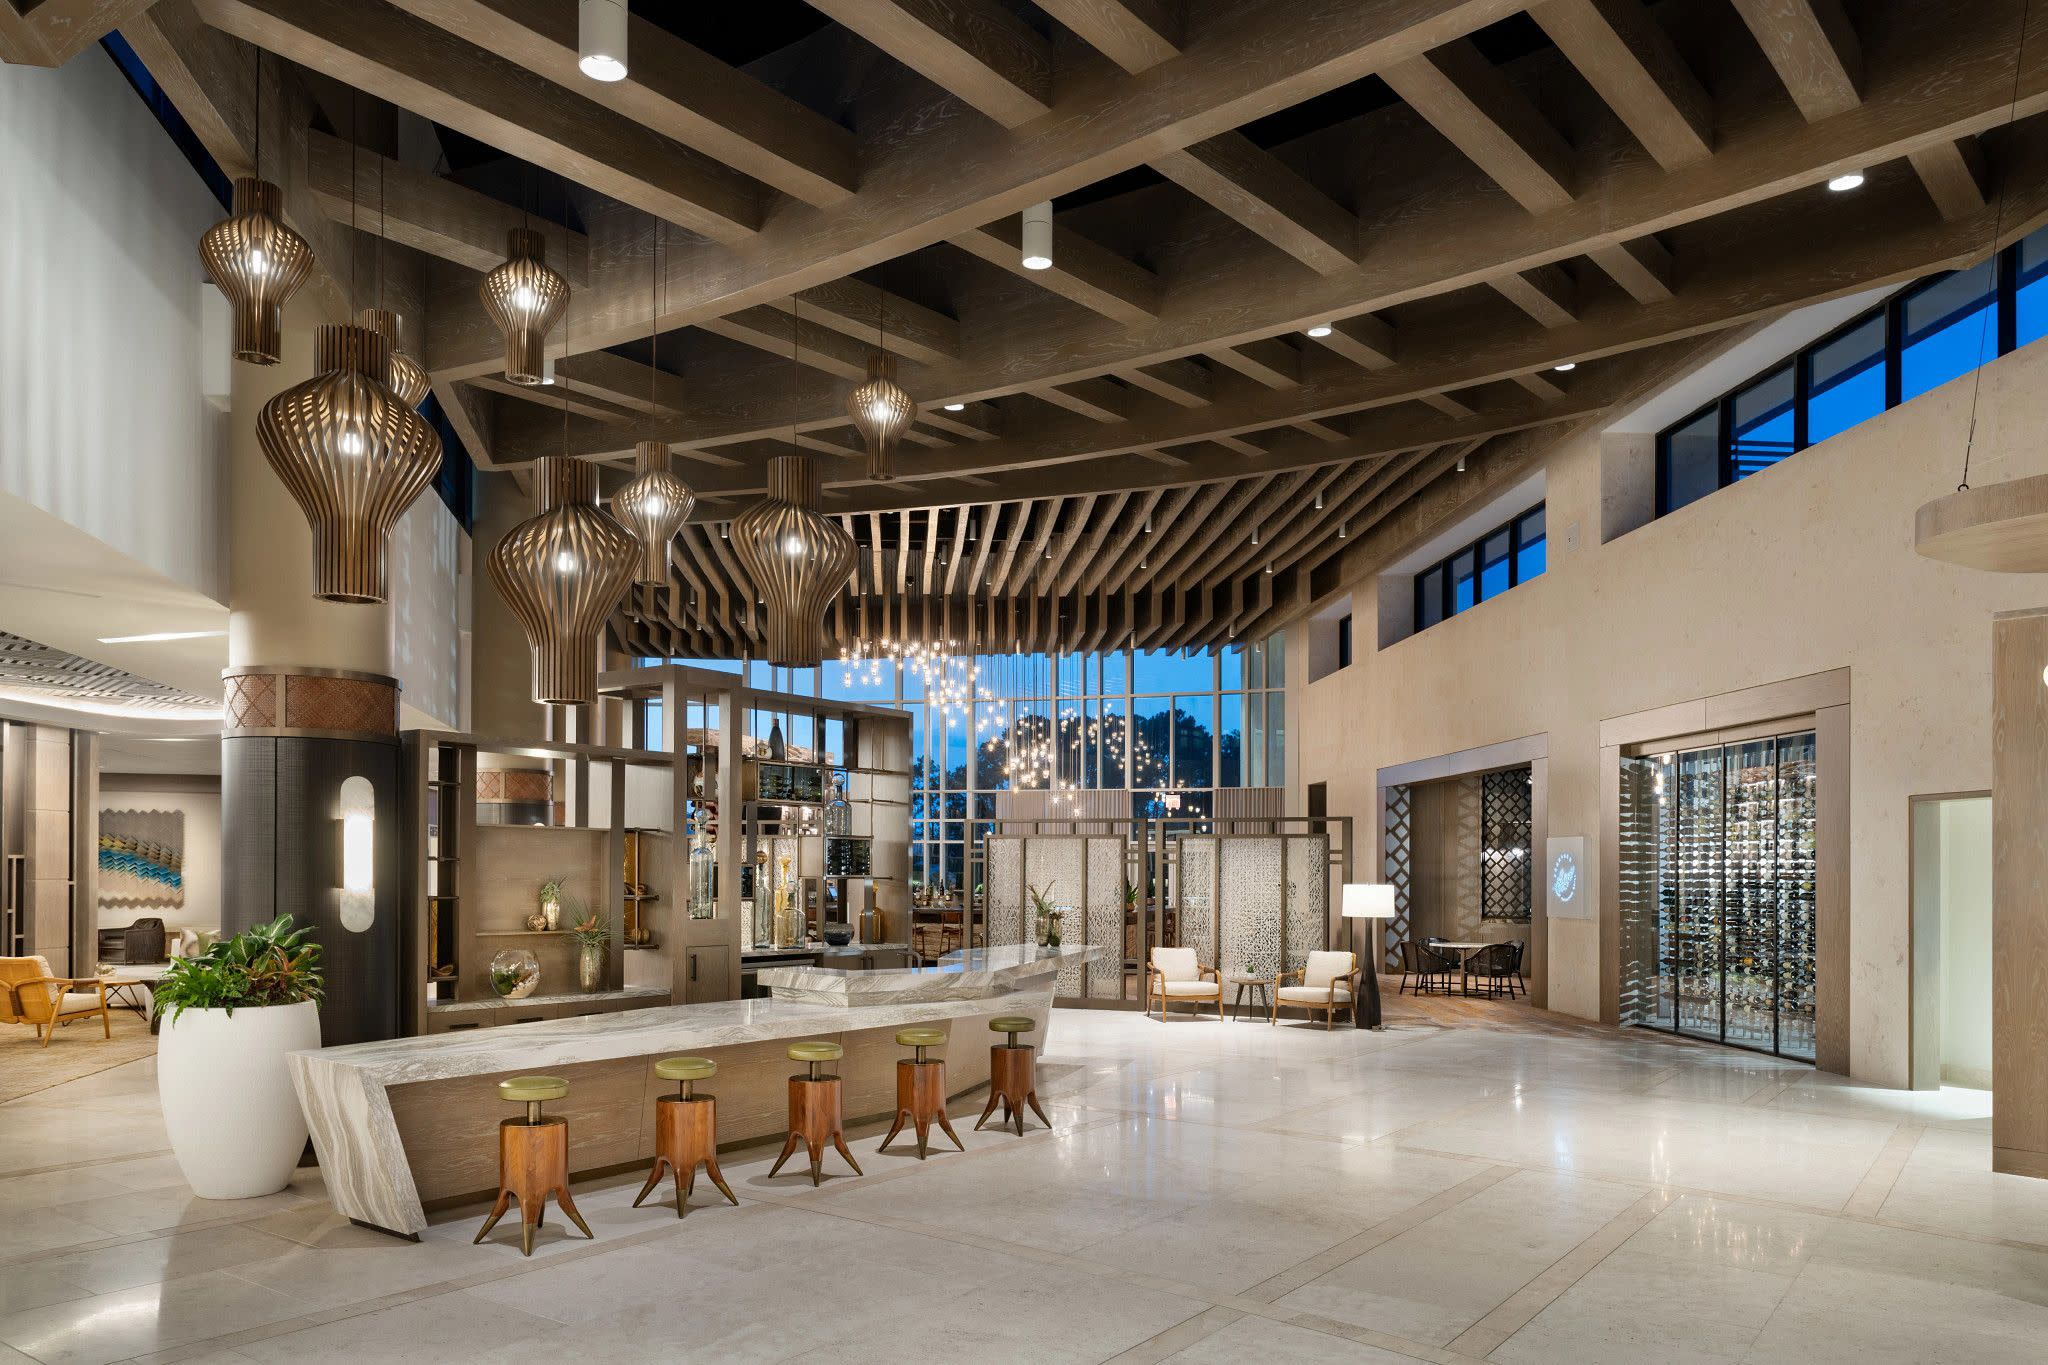 Lobby Concept Art for JW Marriott Orlando Bonnet Creek Resort & Spa